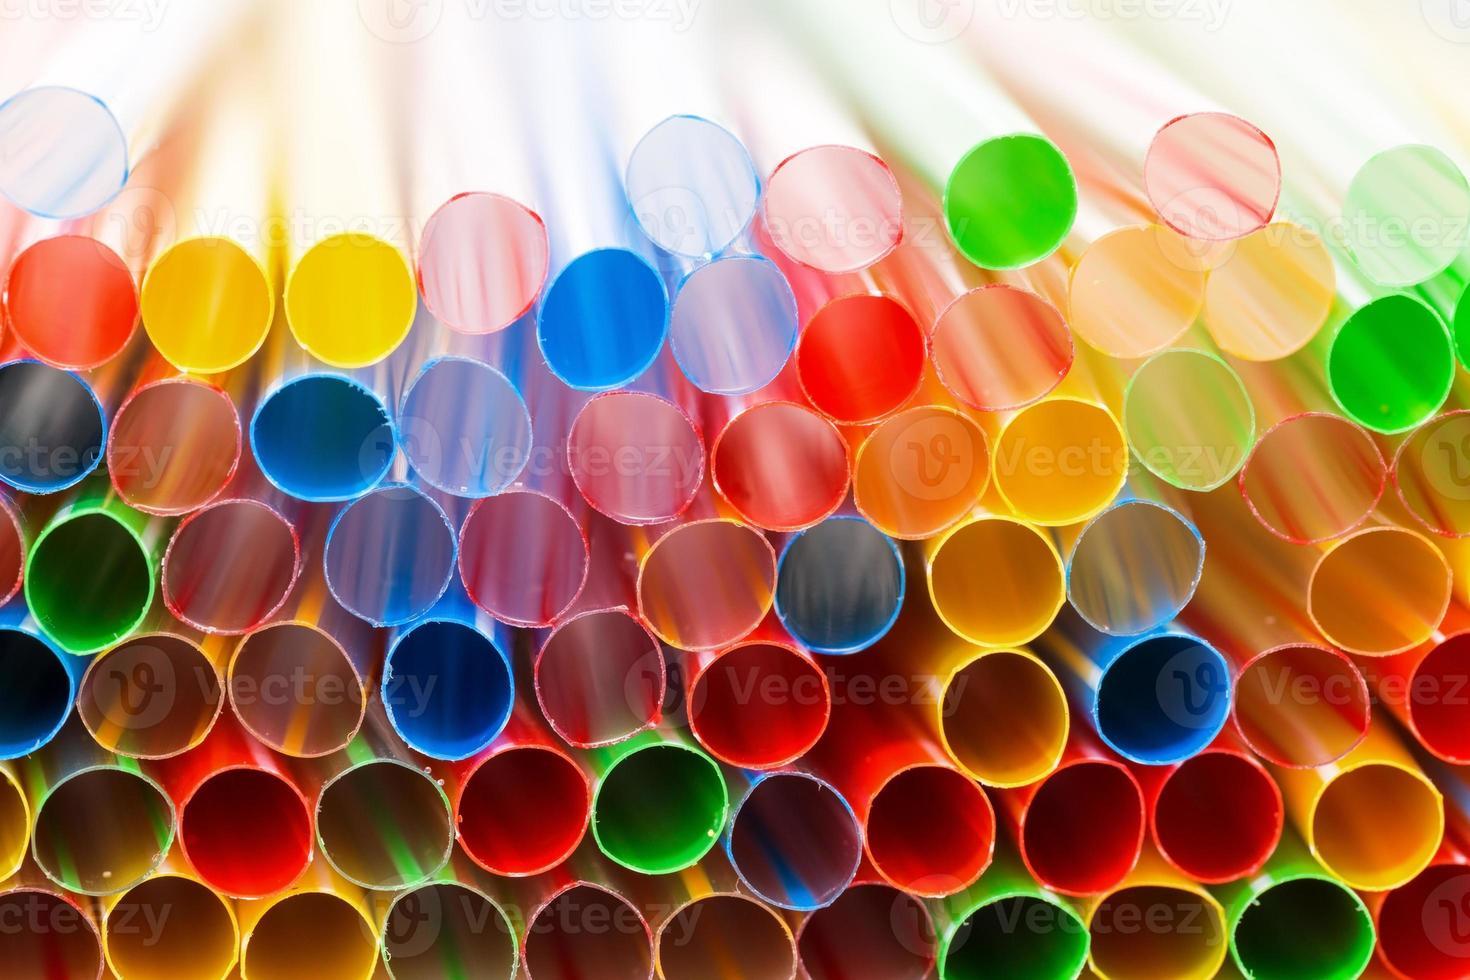 Colored Plastic Drinking Straws closeup photo